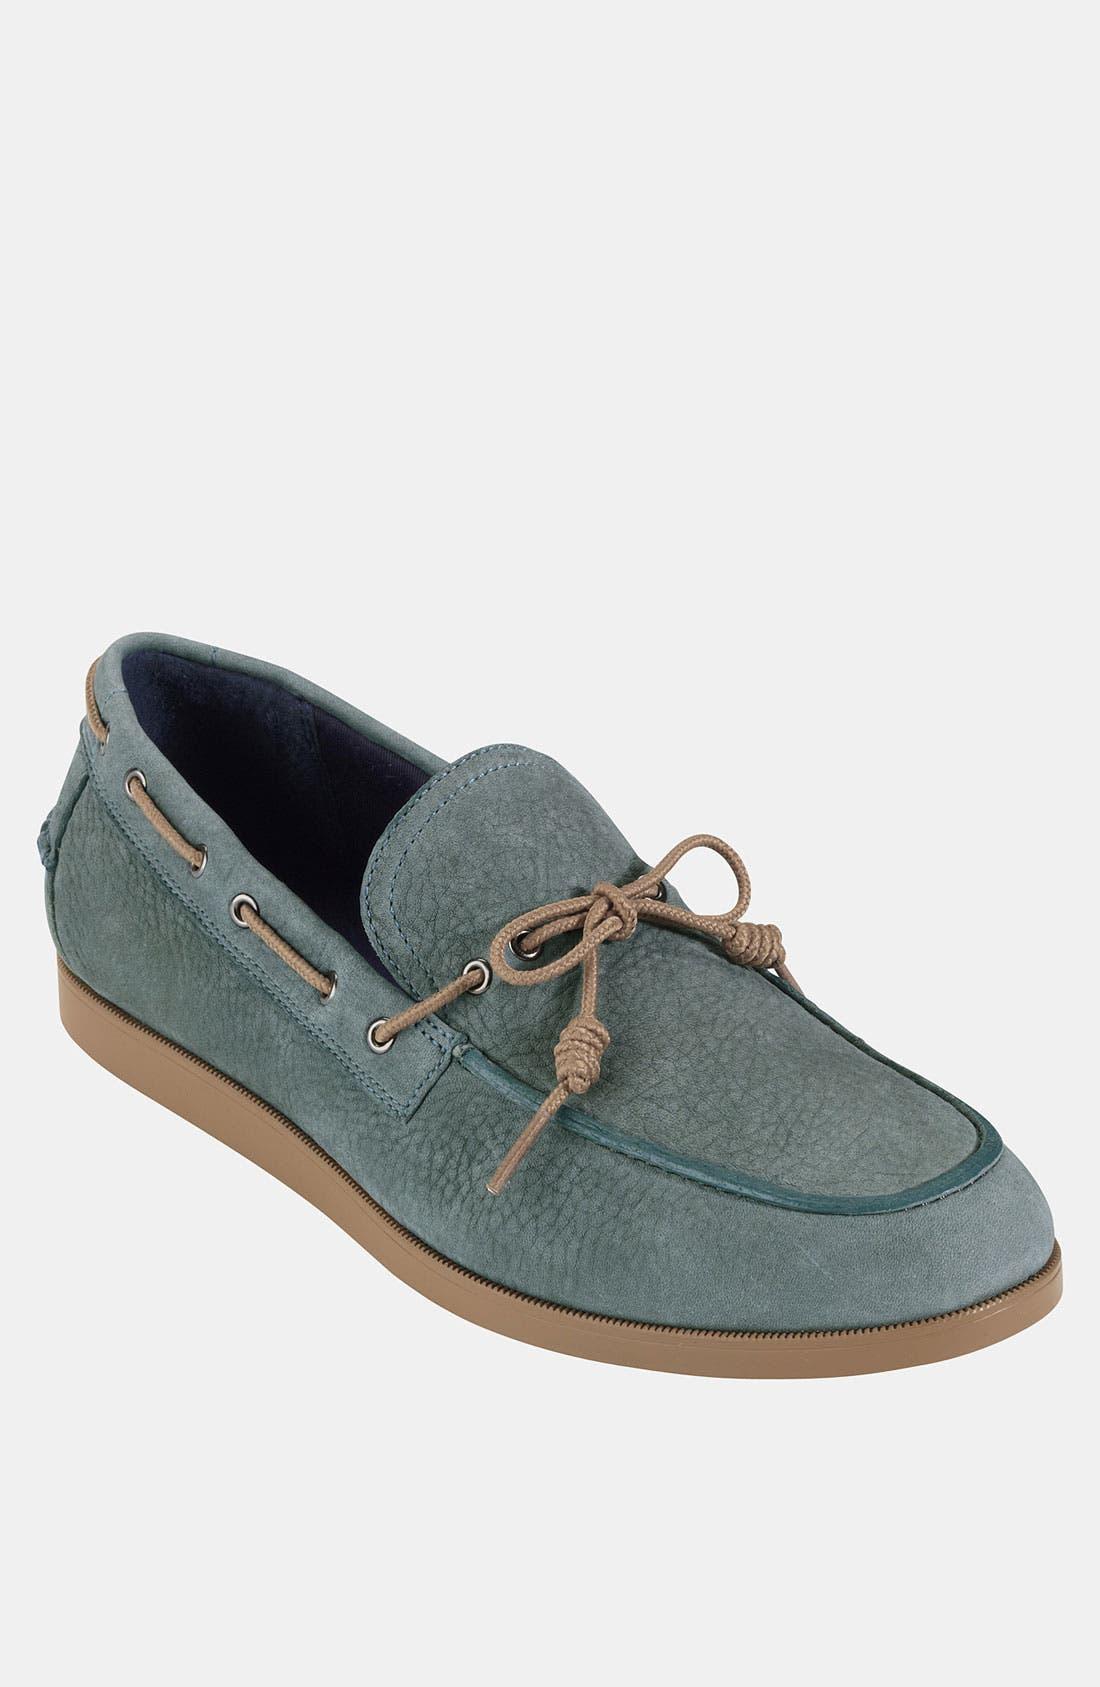 Alternate Image 1 Selected - Cole Haan 'Air Mason' Boat Shoe   (Men)